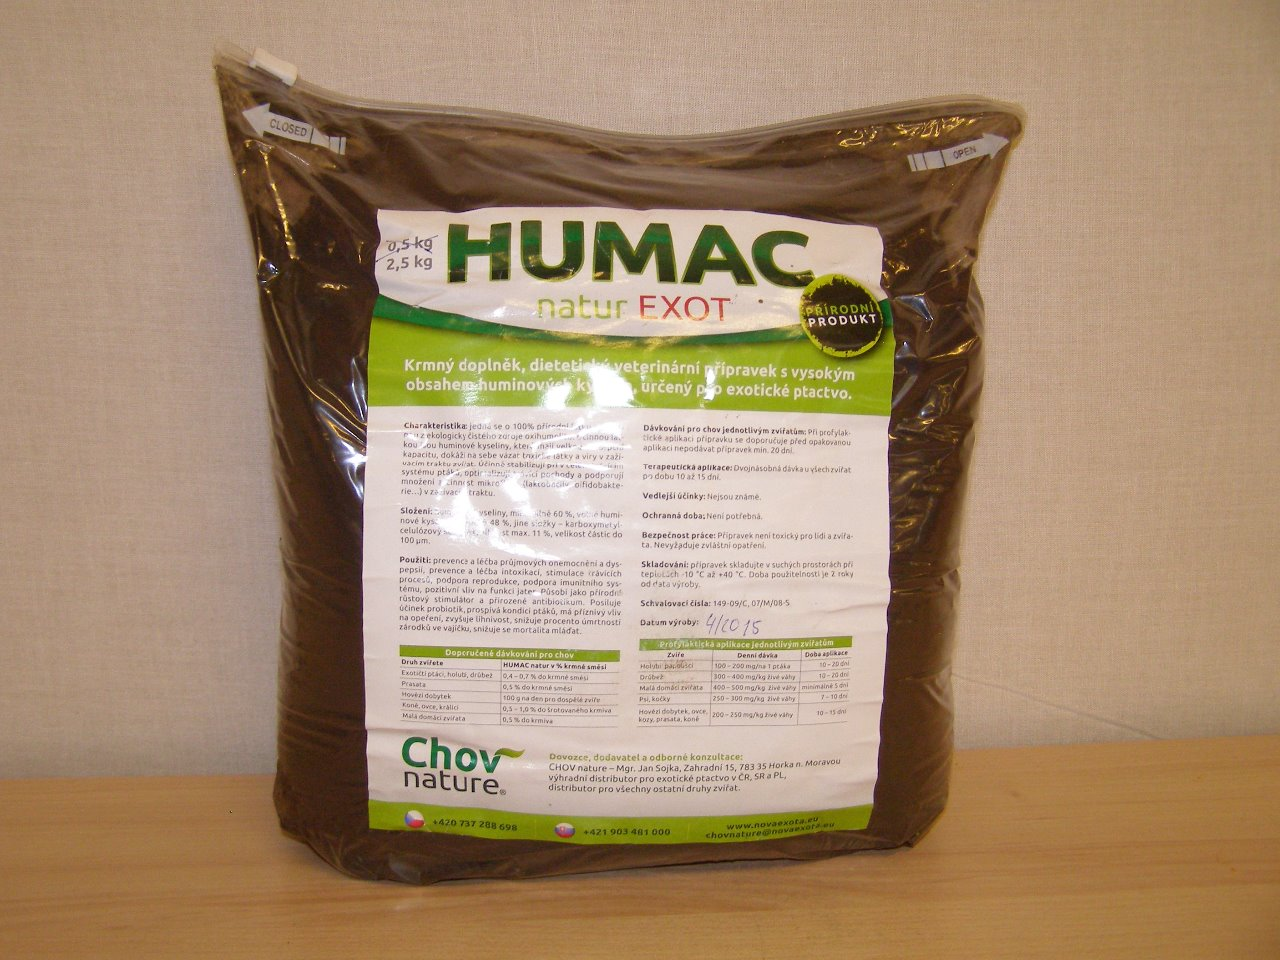 Chov nature Humac natur Exot 2,5 kg